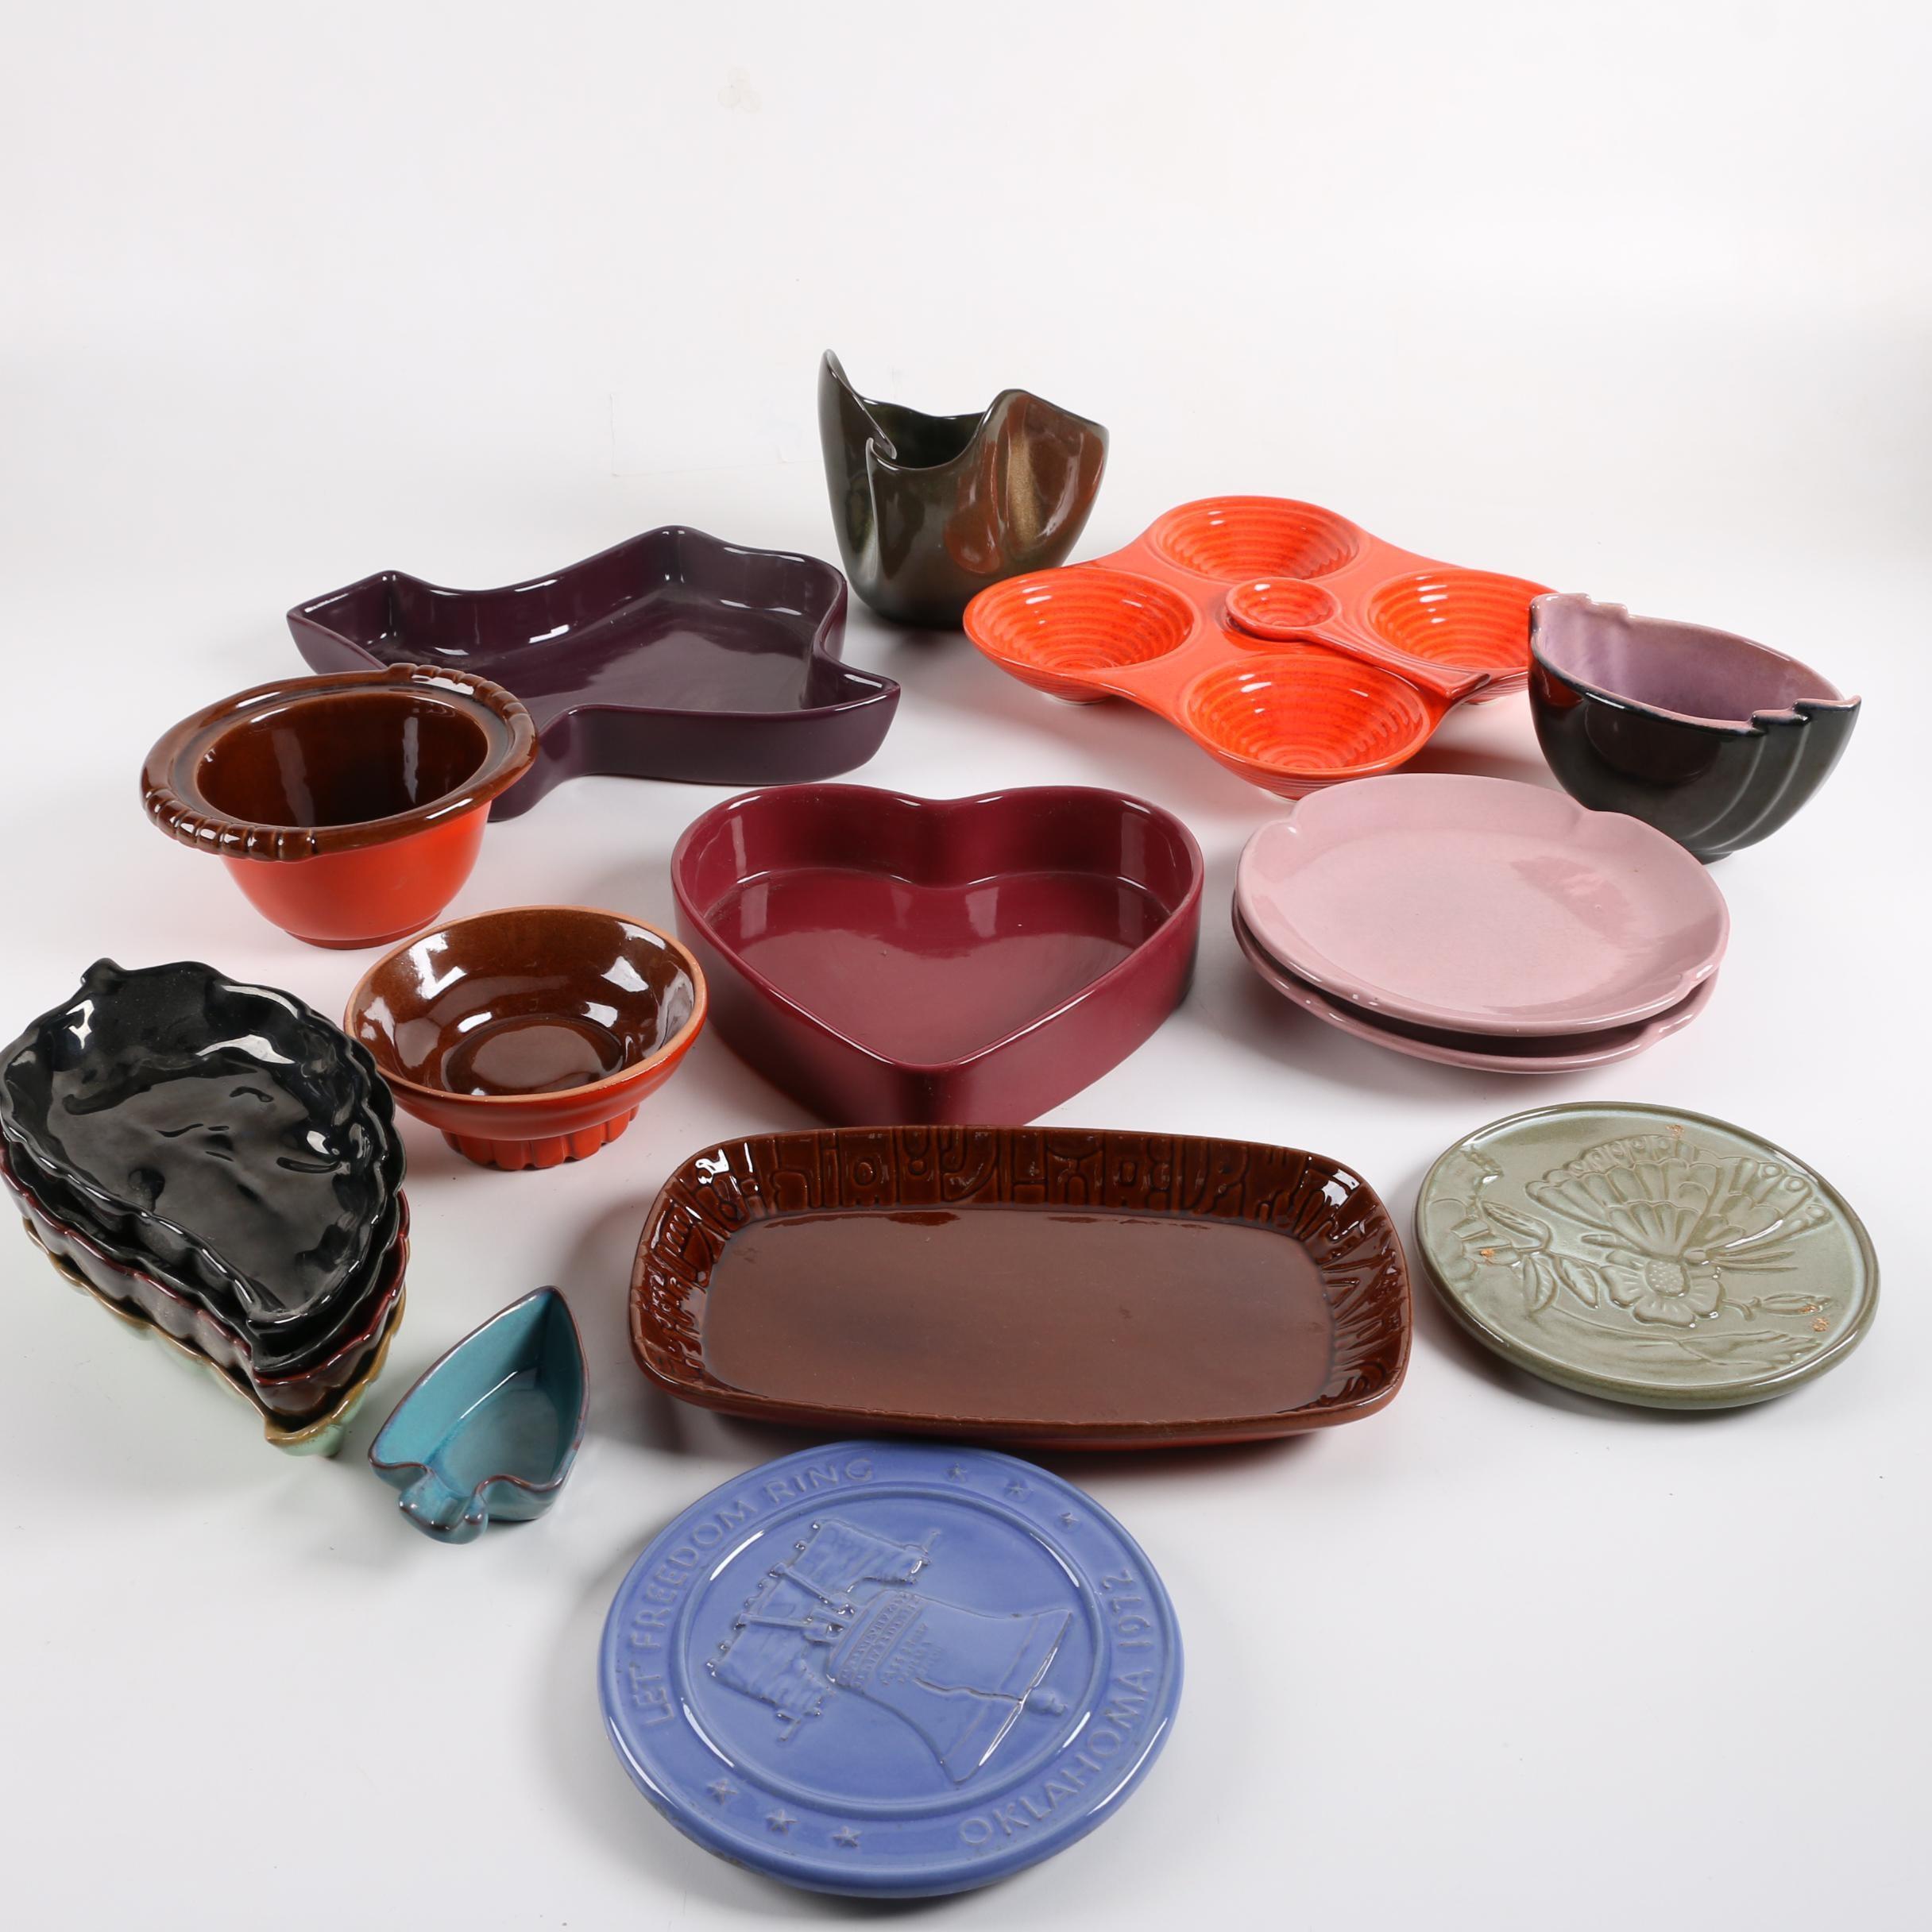 Vintage Frankoma Pottery Serveware